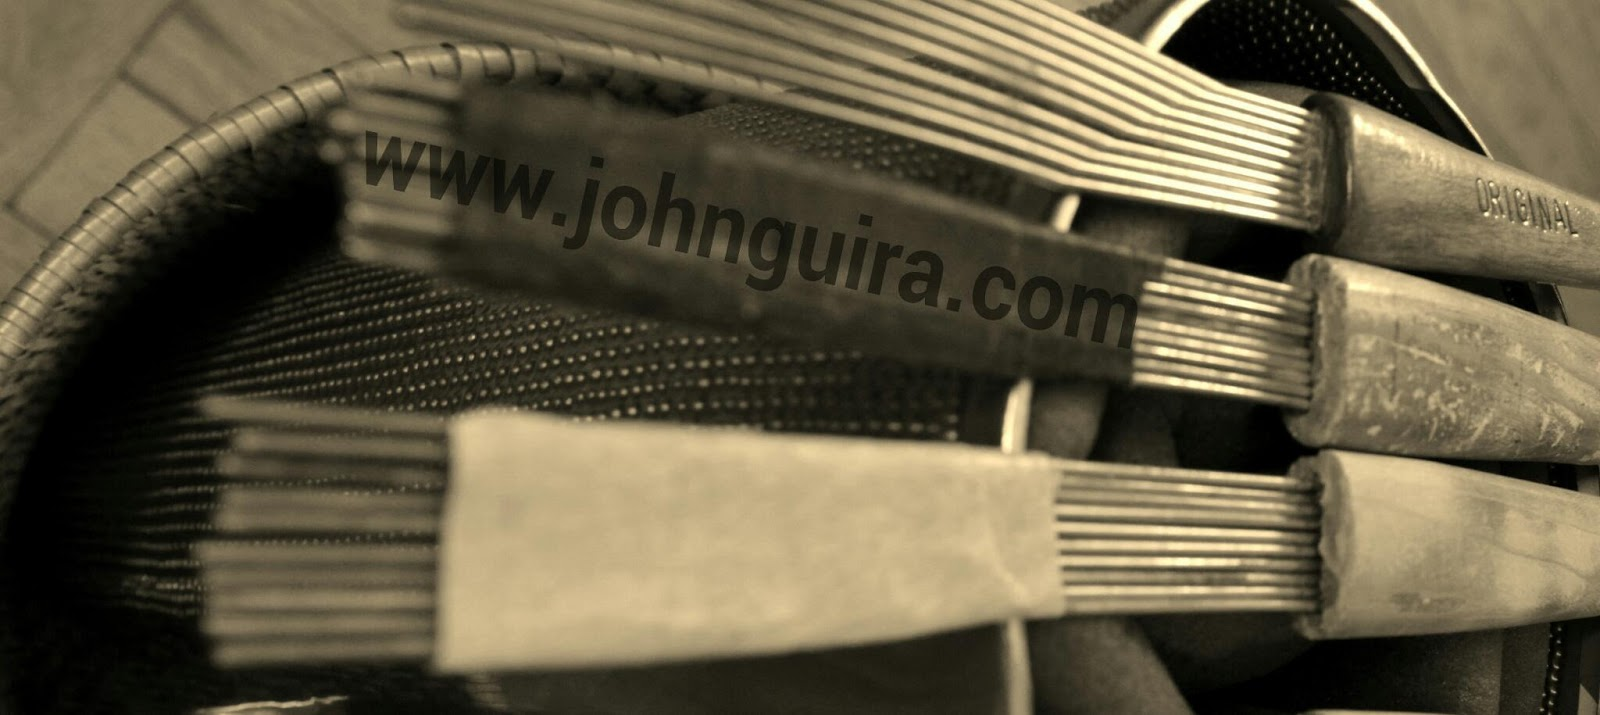 Ganchos De Guira | JohnGuira